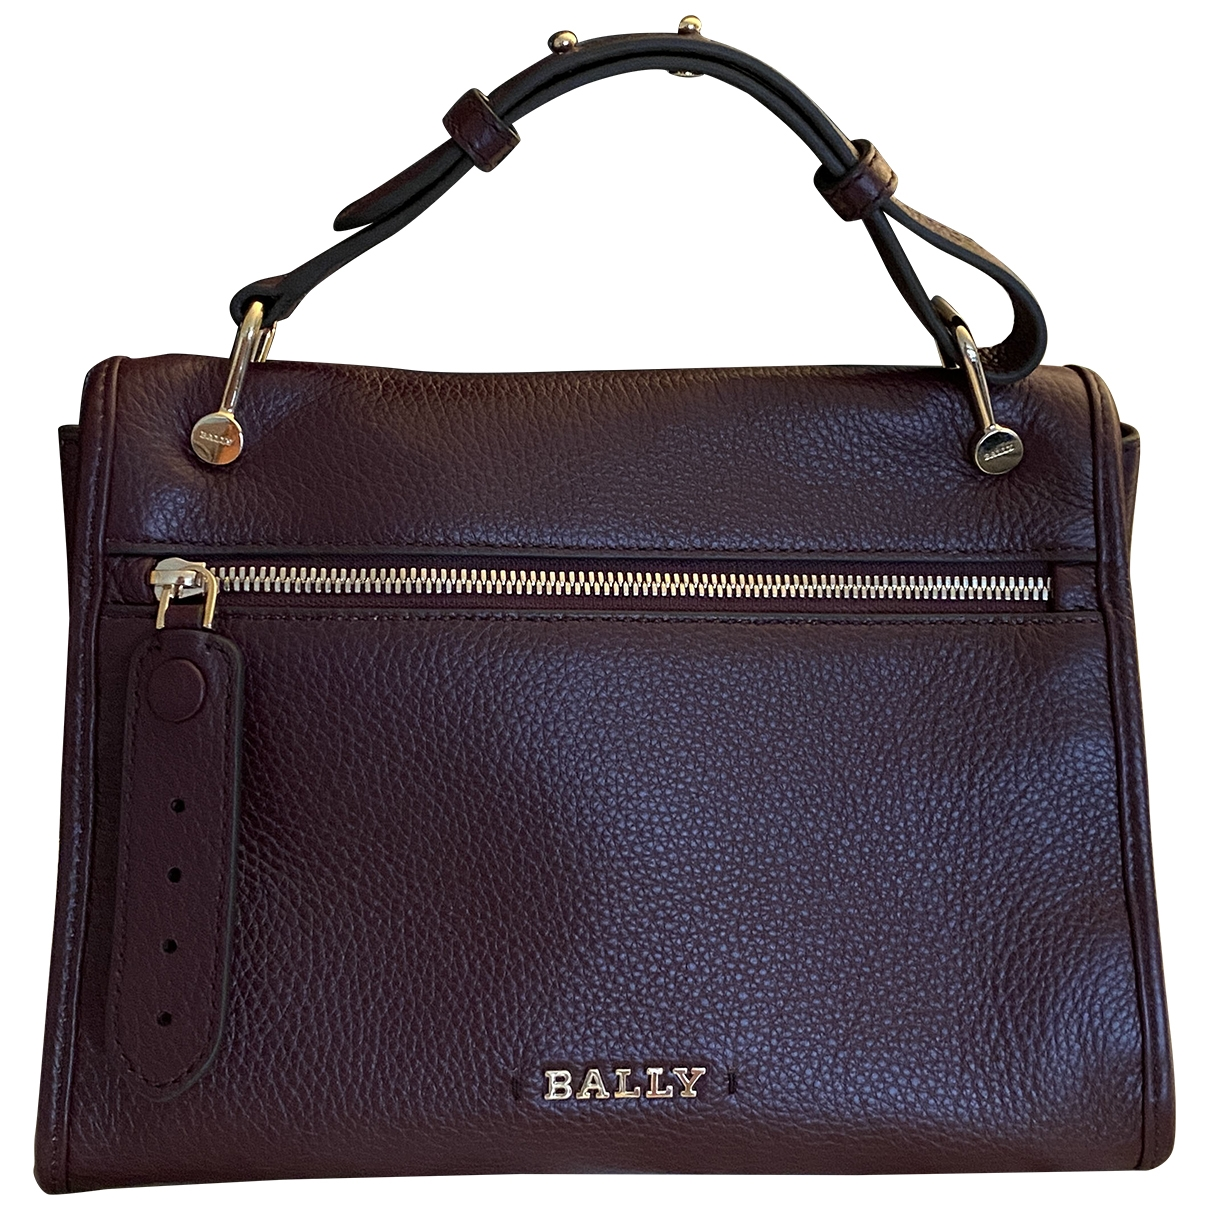 Bally \N Burgundy Leather handbag for Women \N